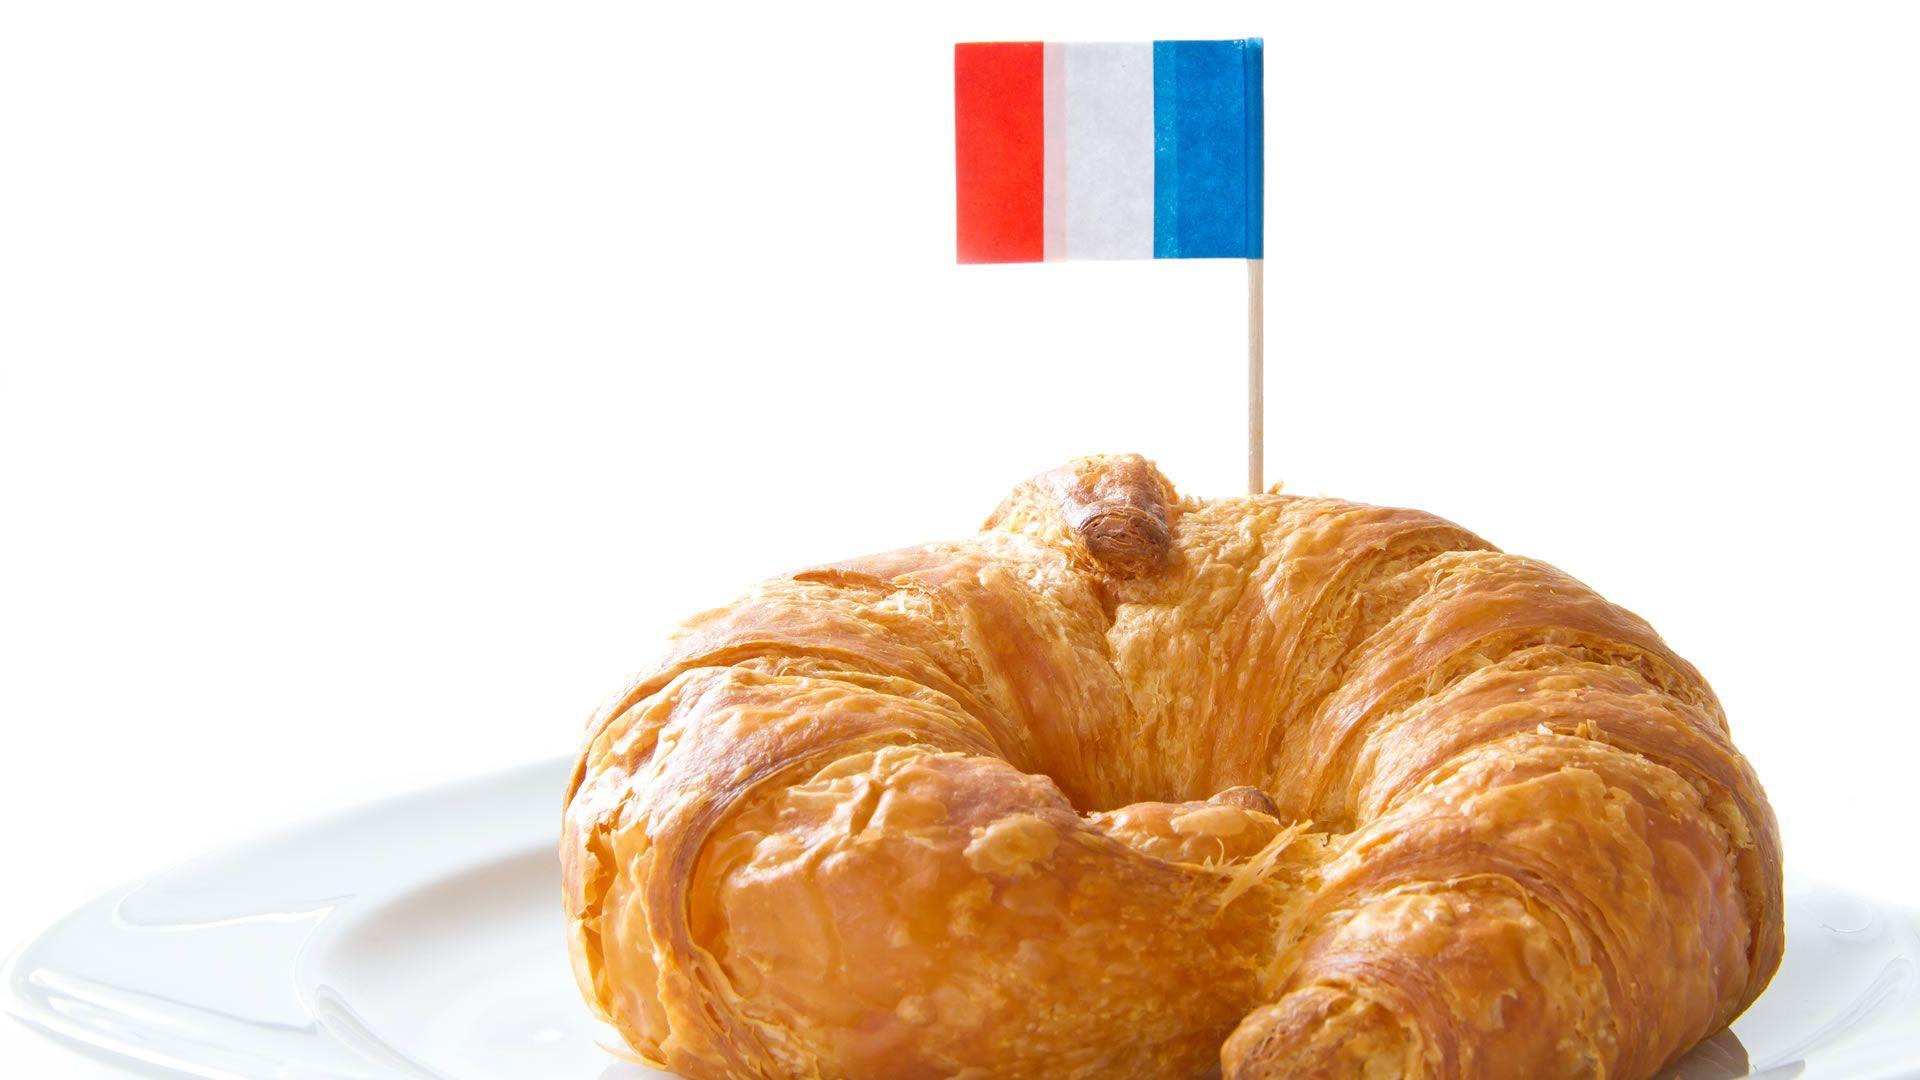 Platos t picos de francia francia francia platos mundo for Platos tipicos de francia